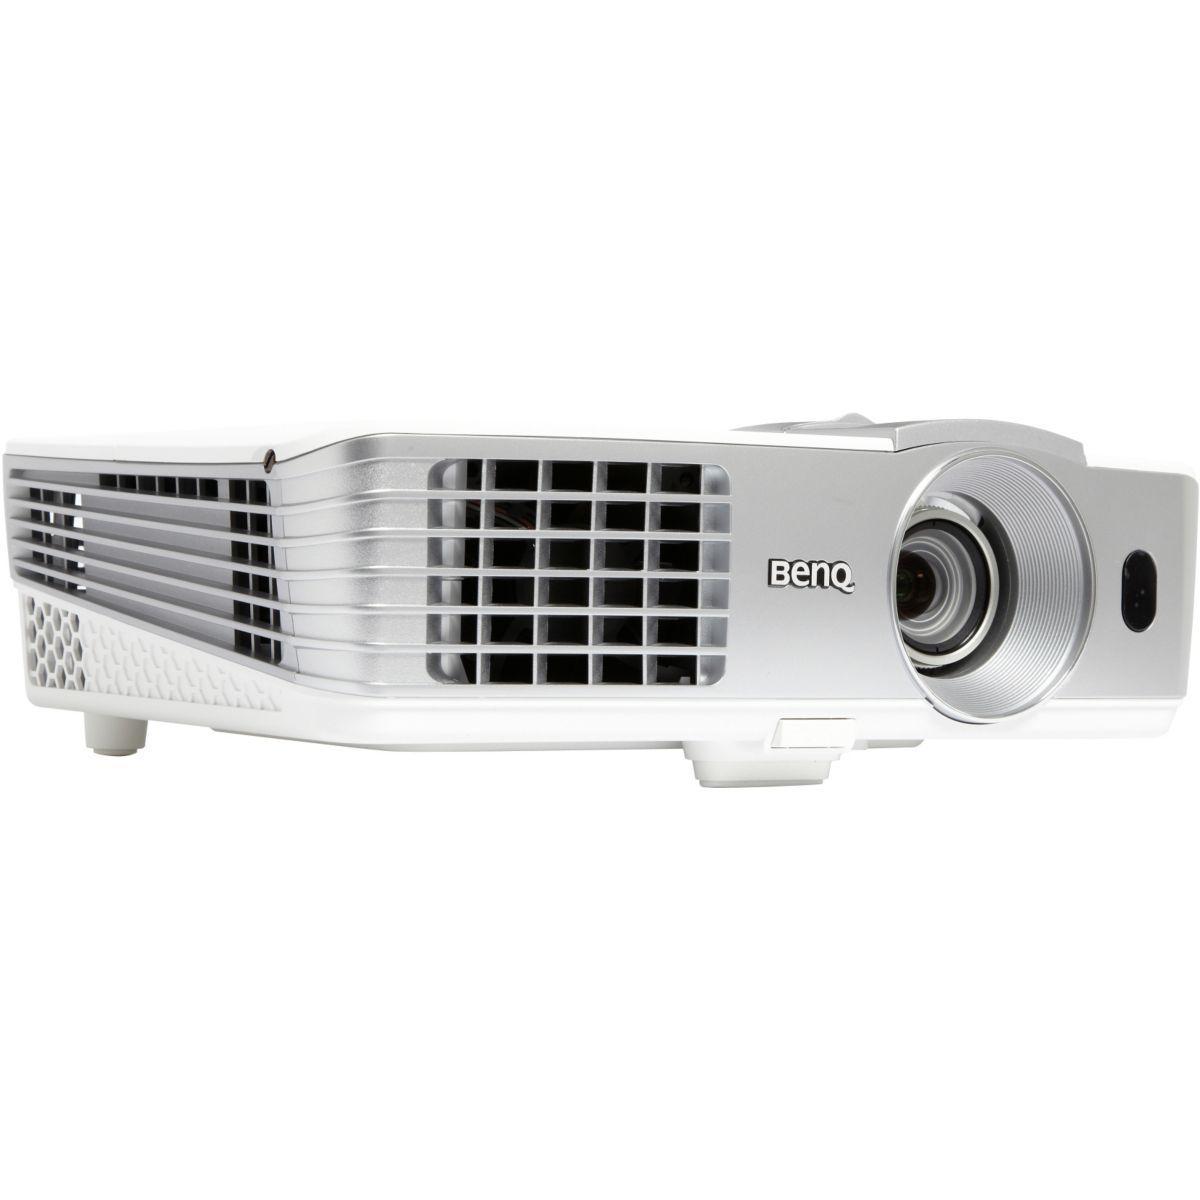 Pack promo vidéoprojecteur home cinema benq w1070+ + ecran de projection oray ecran cadre cineframe 16:9 13 (photo)